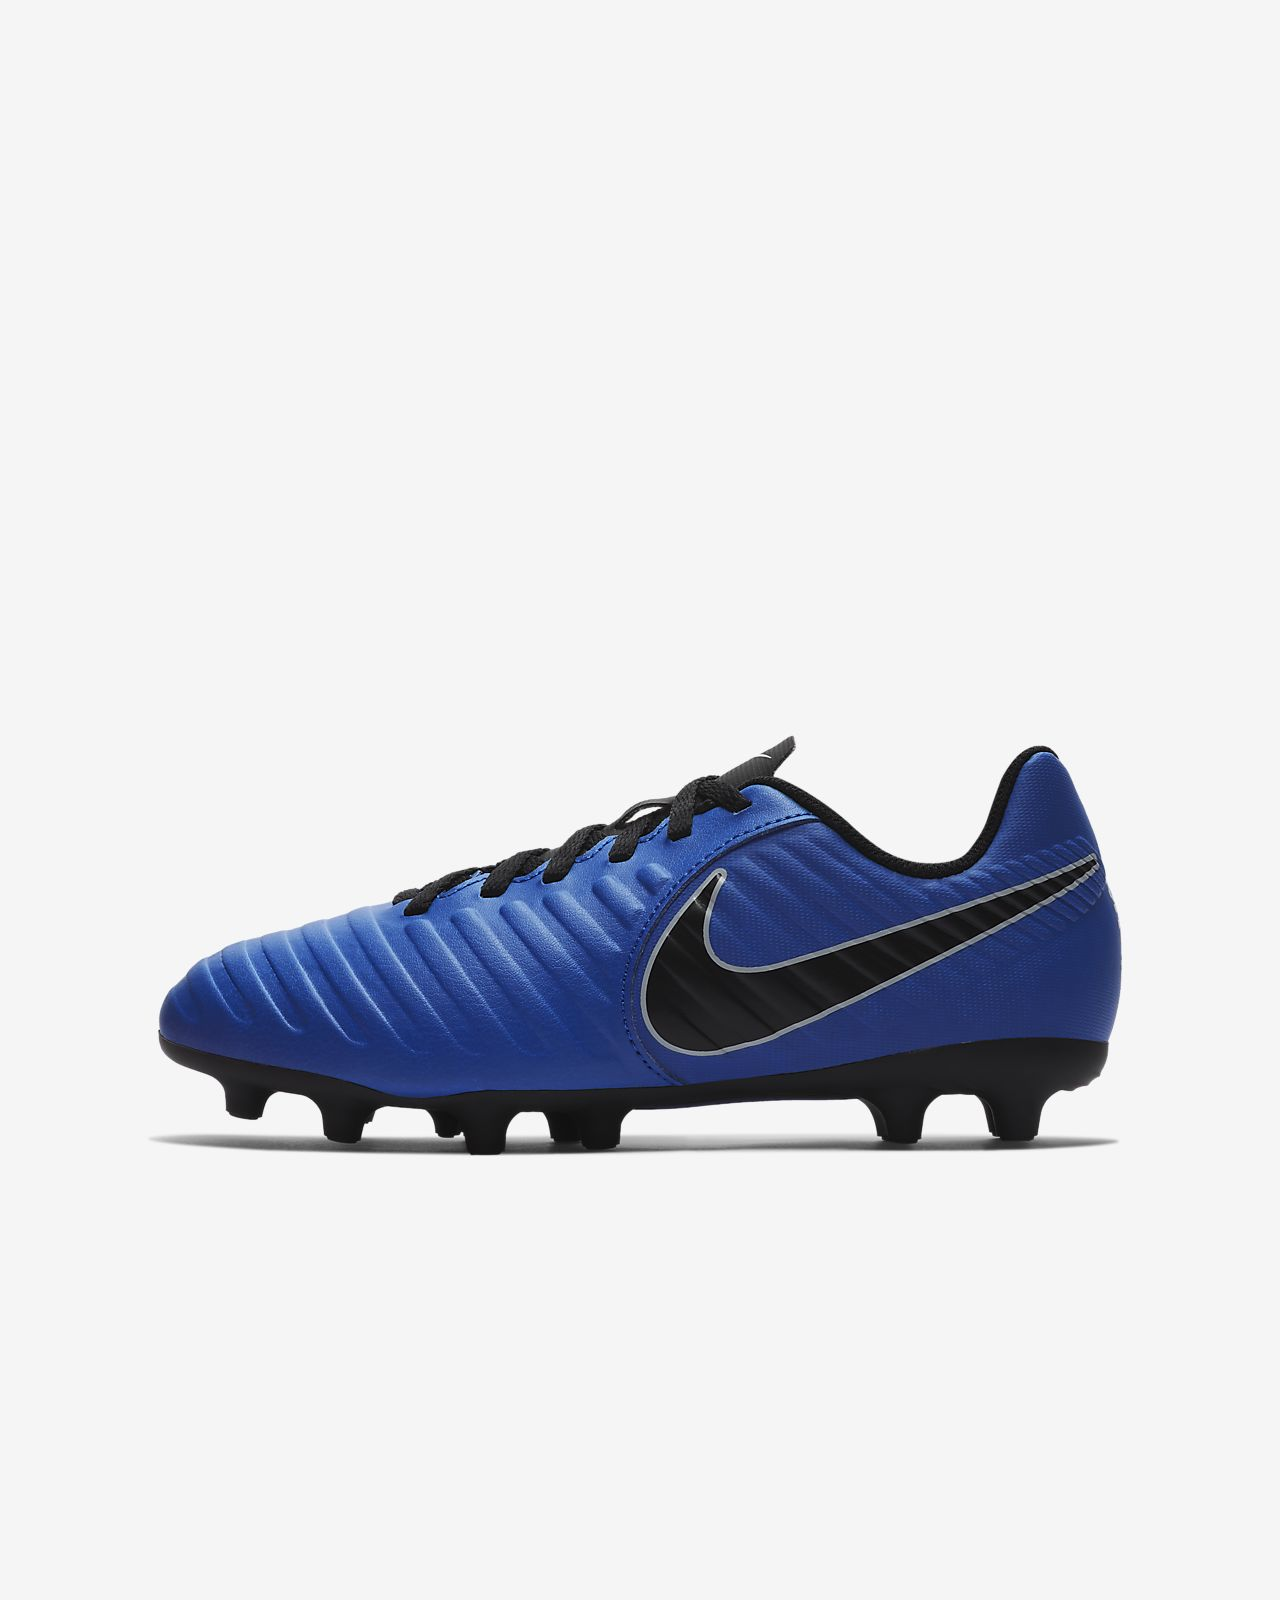 Scarpe da Ginnastica Basse Uomo Nike Legend 7 Club Fg Giochi